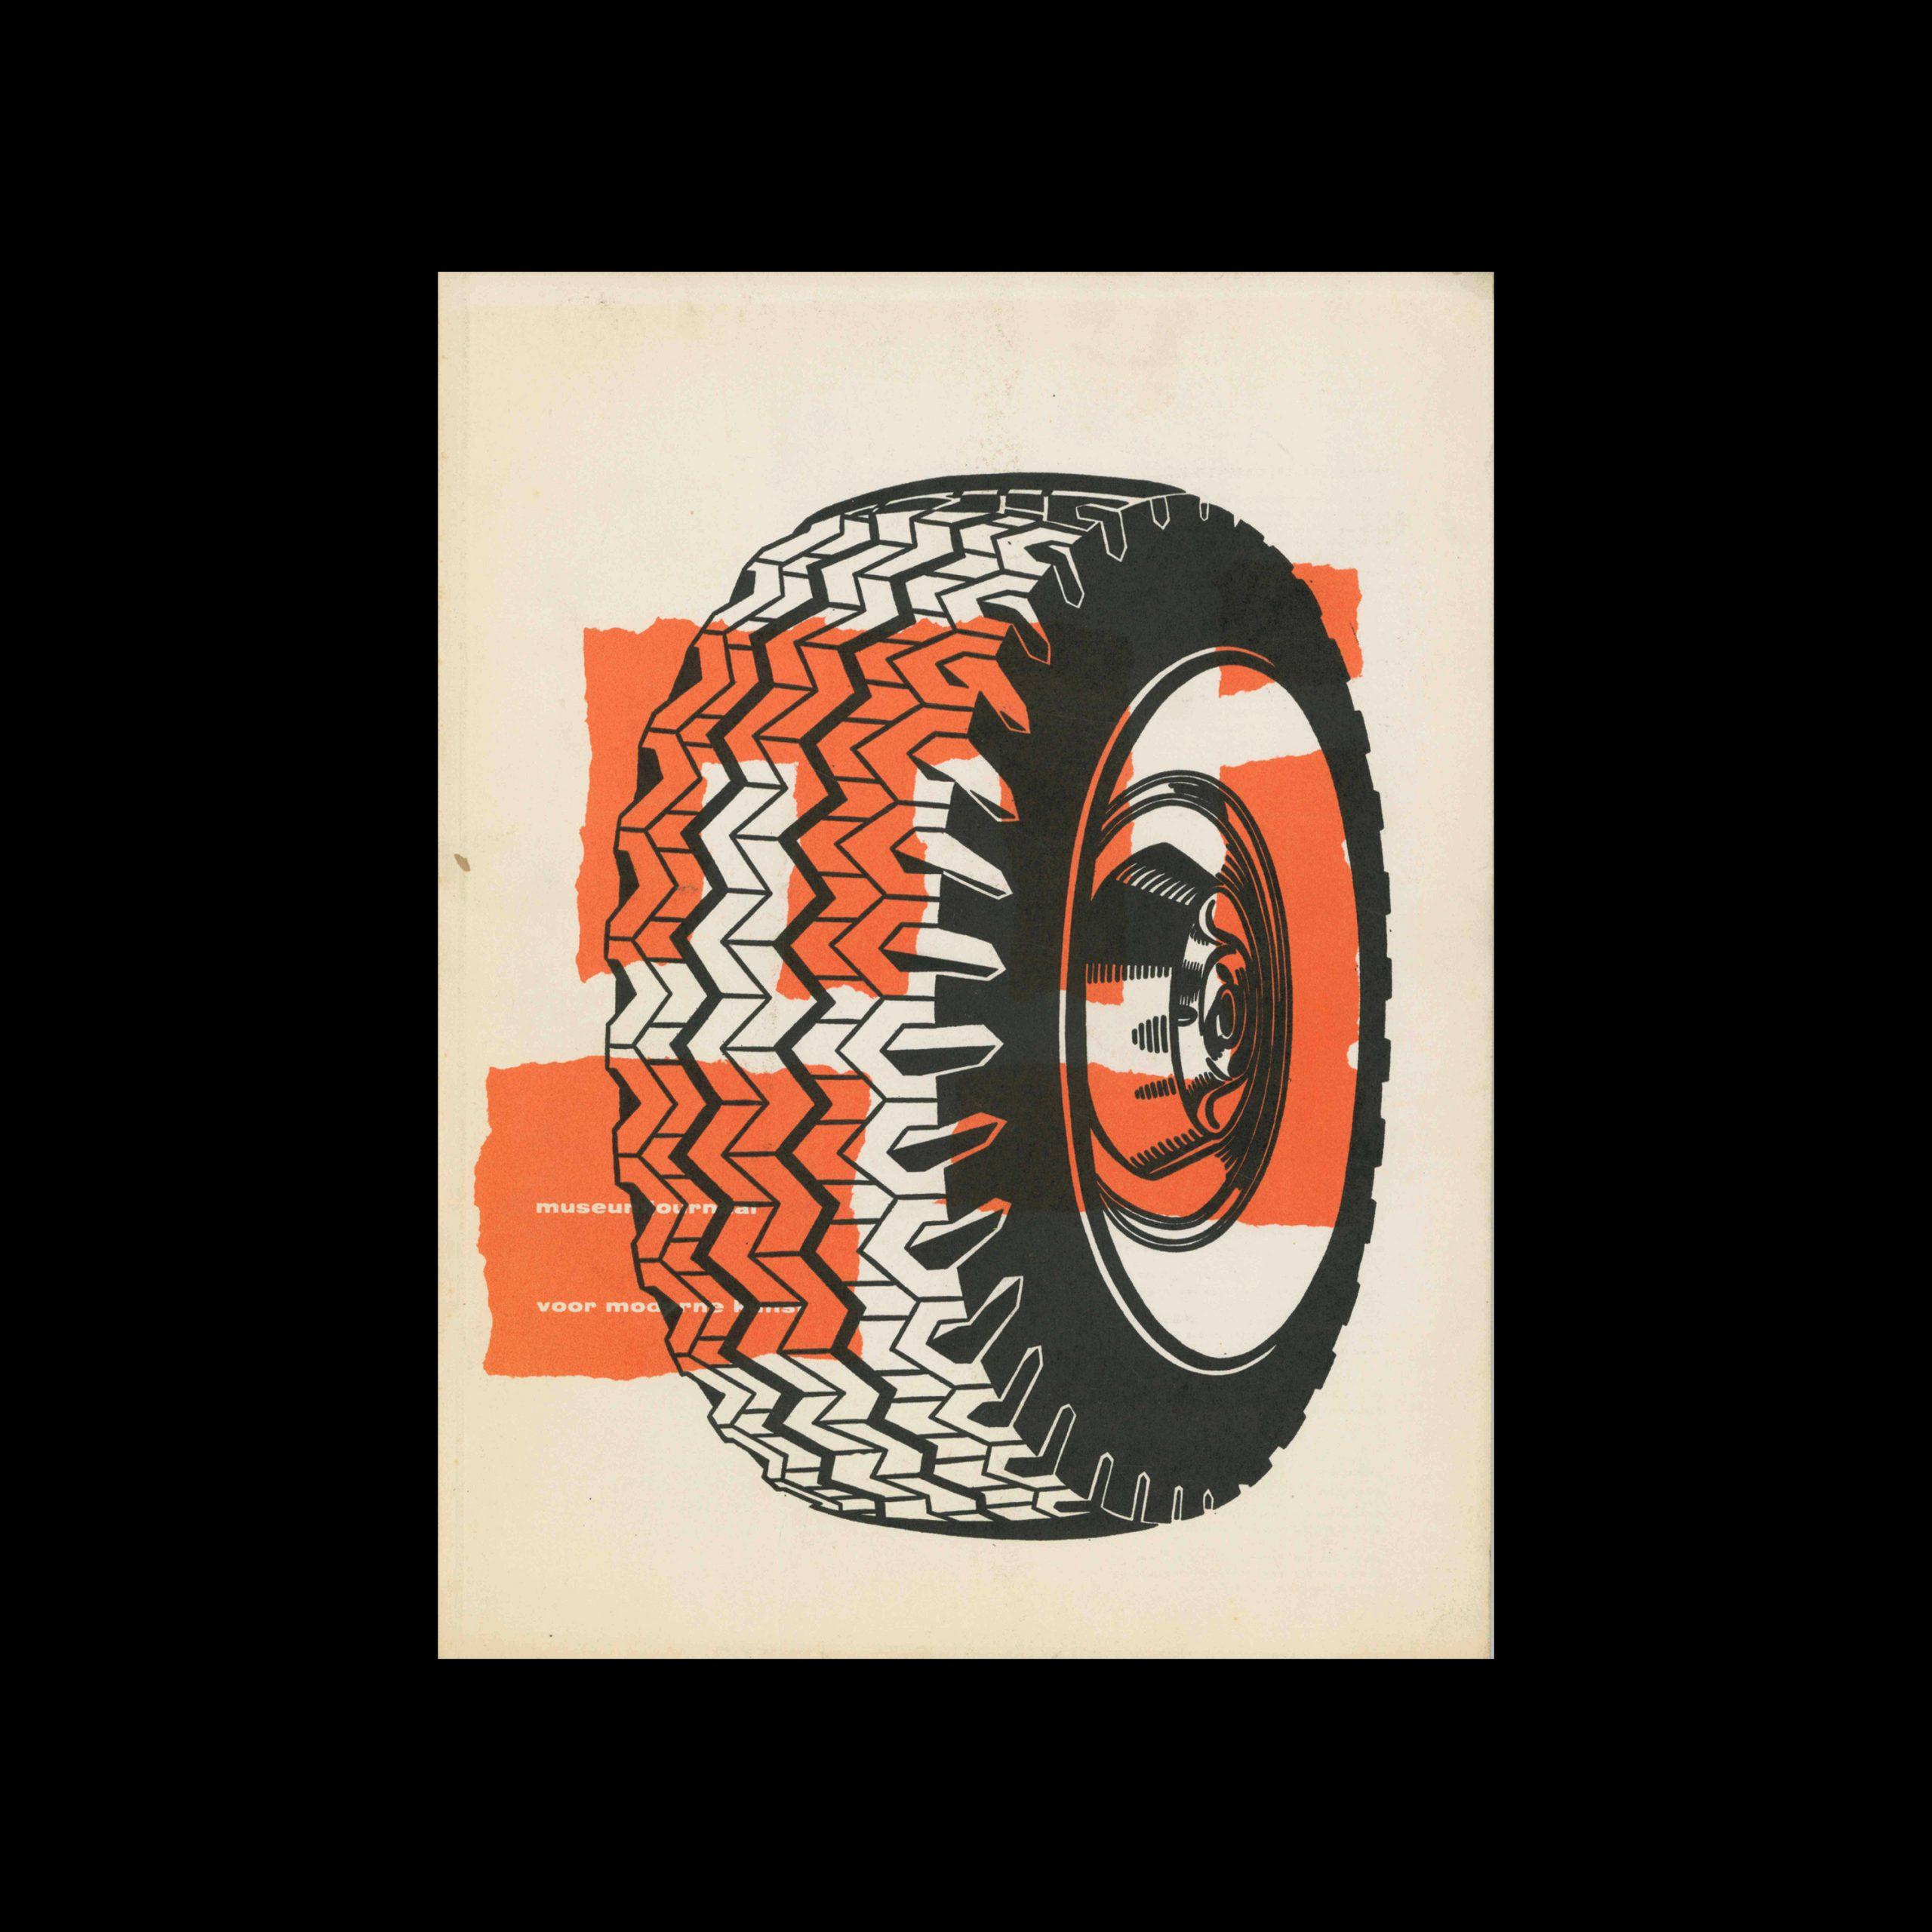 Museumjournaal, Serie 9 no8, 1963. Cover illustration by Roy Lichtenstein.